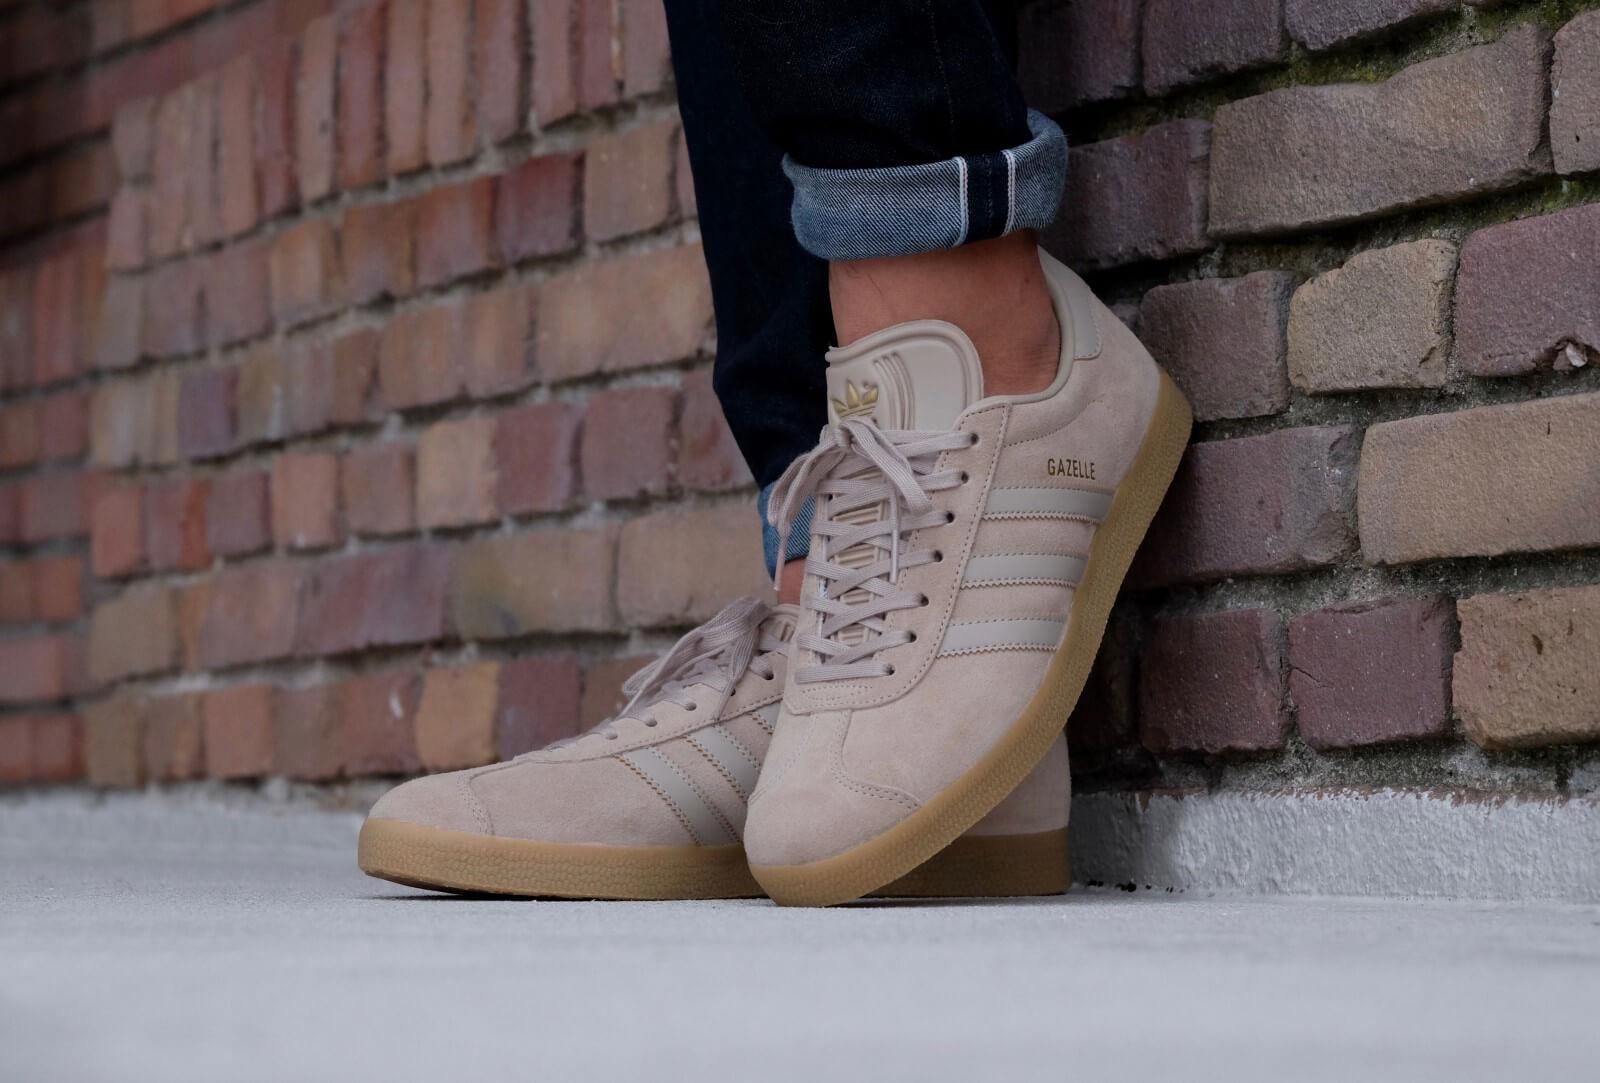 Adidas Gazelle - Clay Brown / Gum